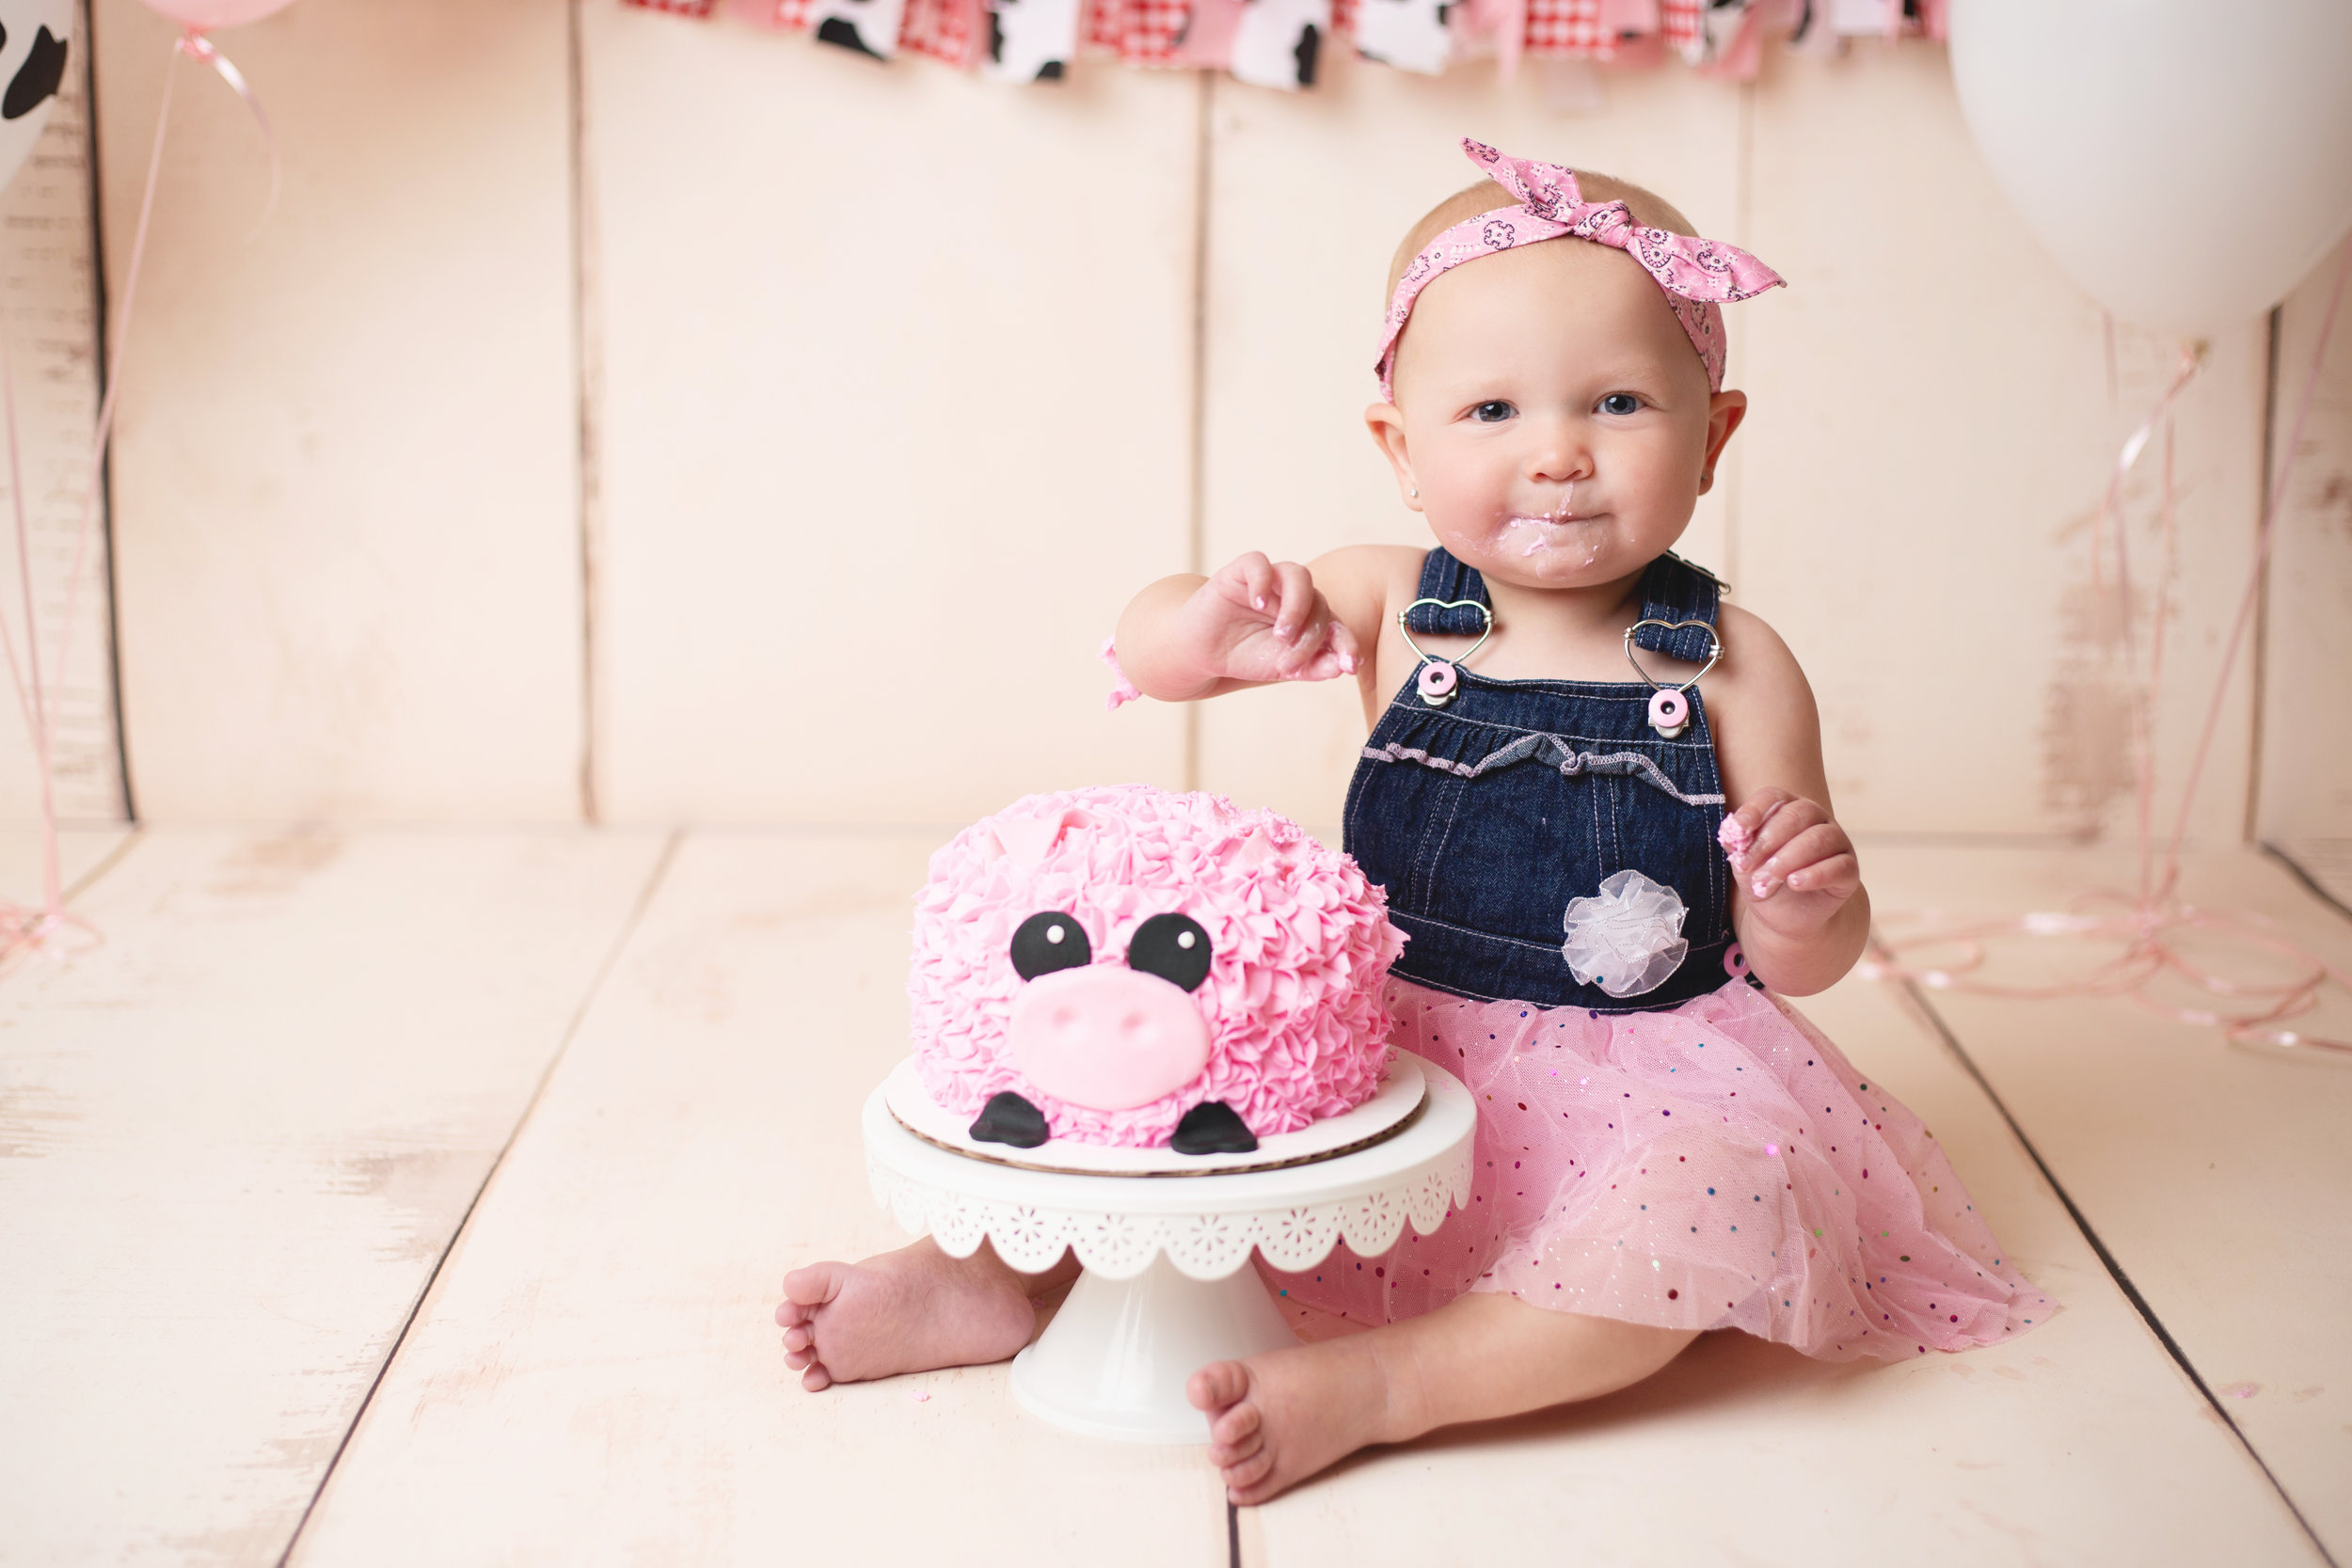 anchorage-cake-smash-photographer-5.jpg